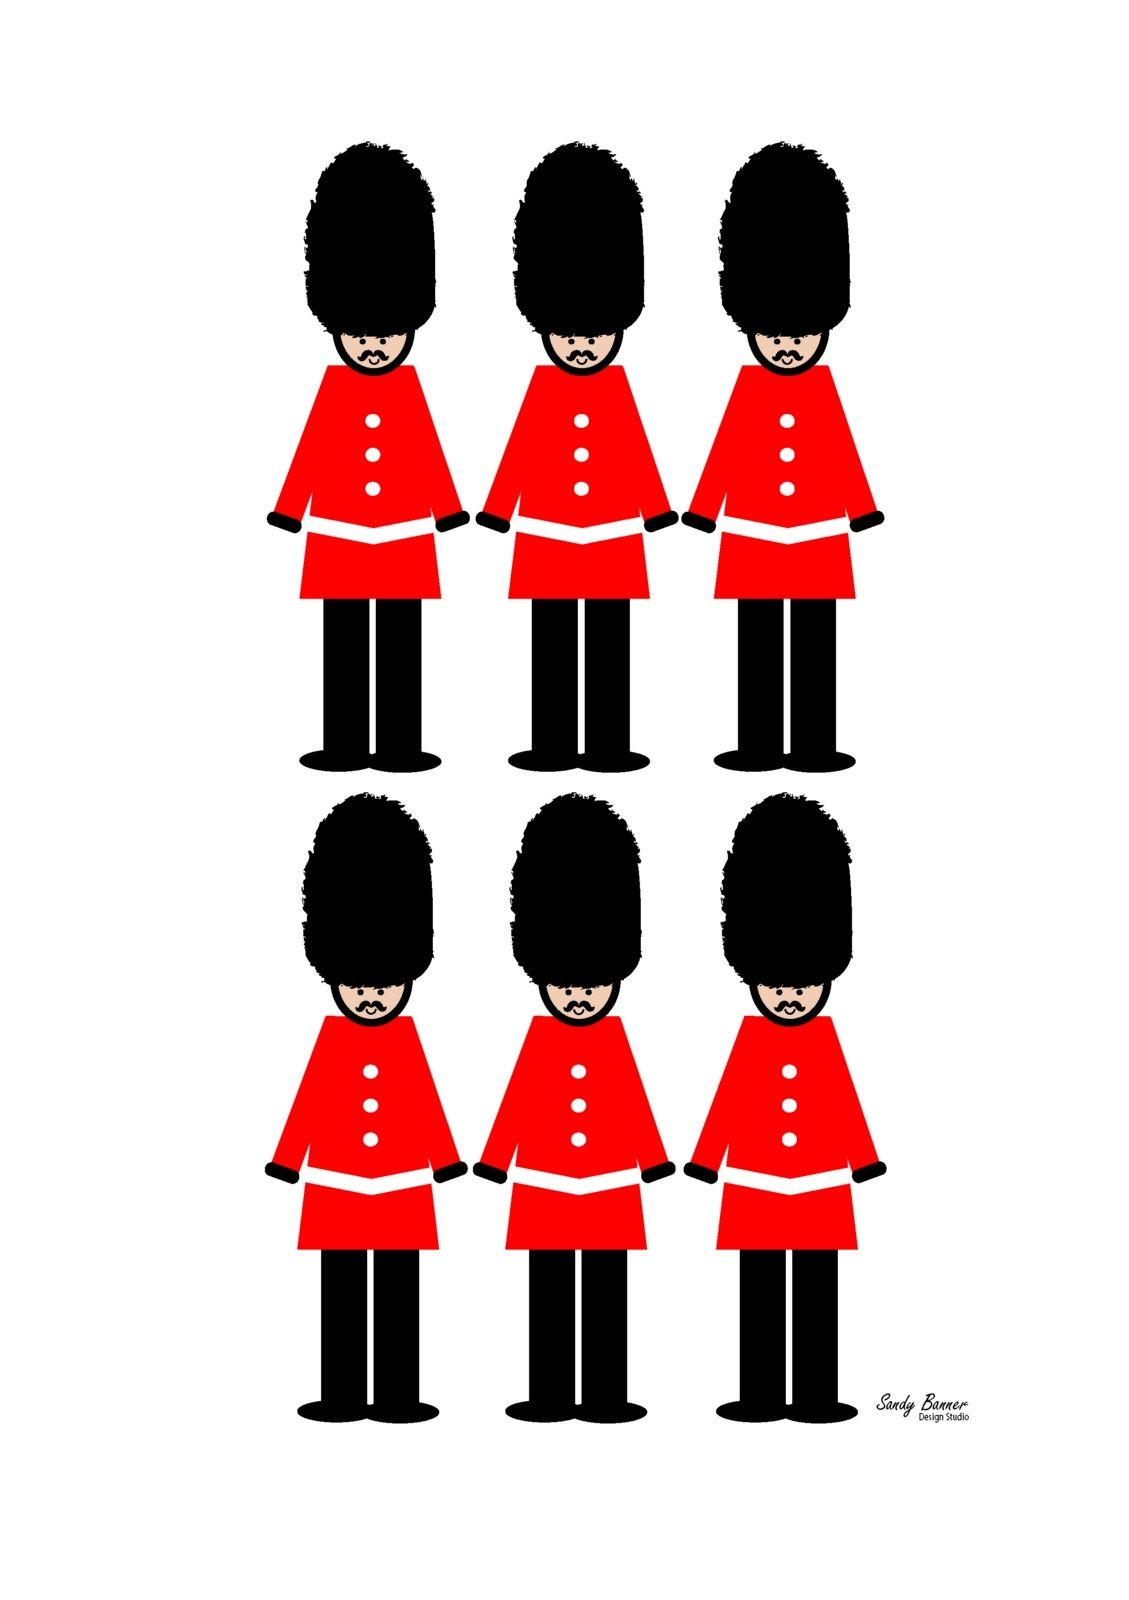 London guards soldier wall decor art print.